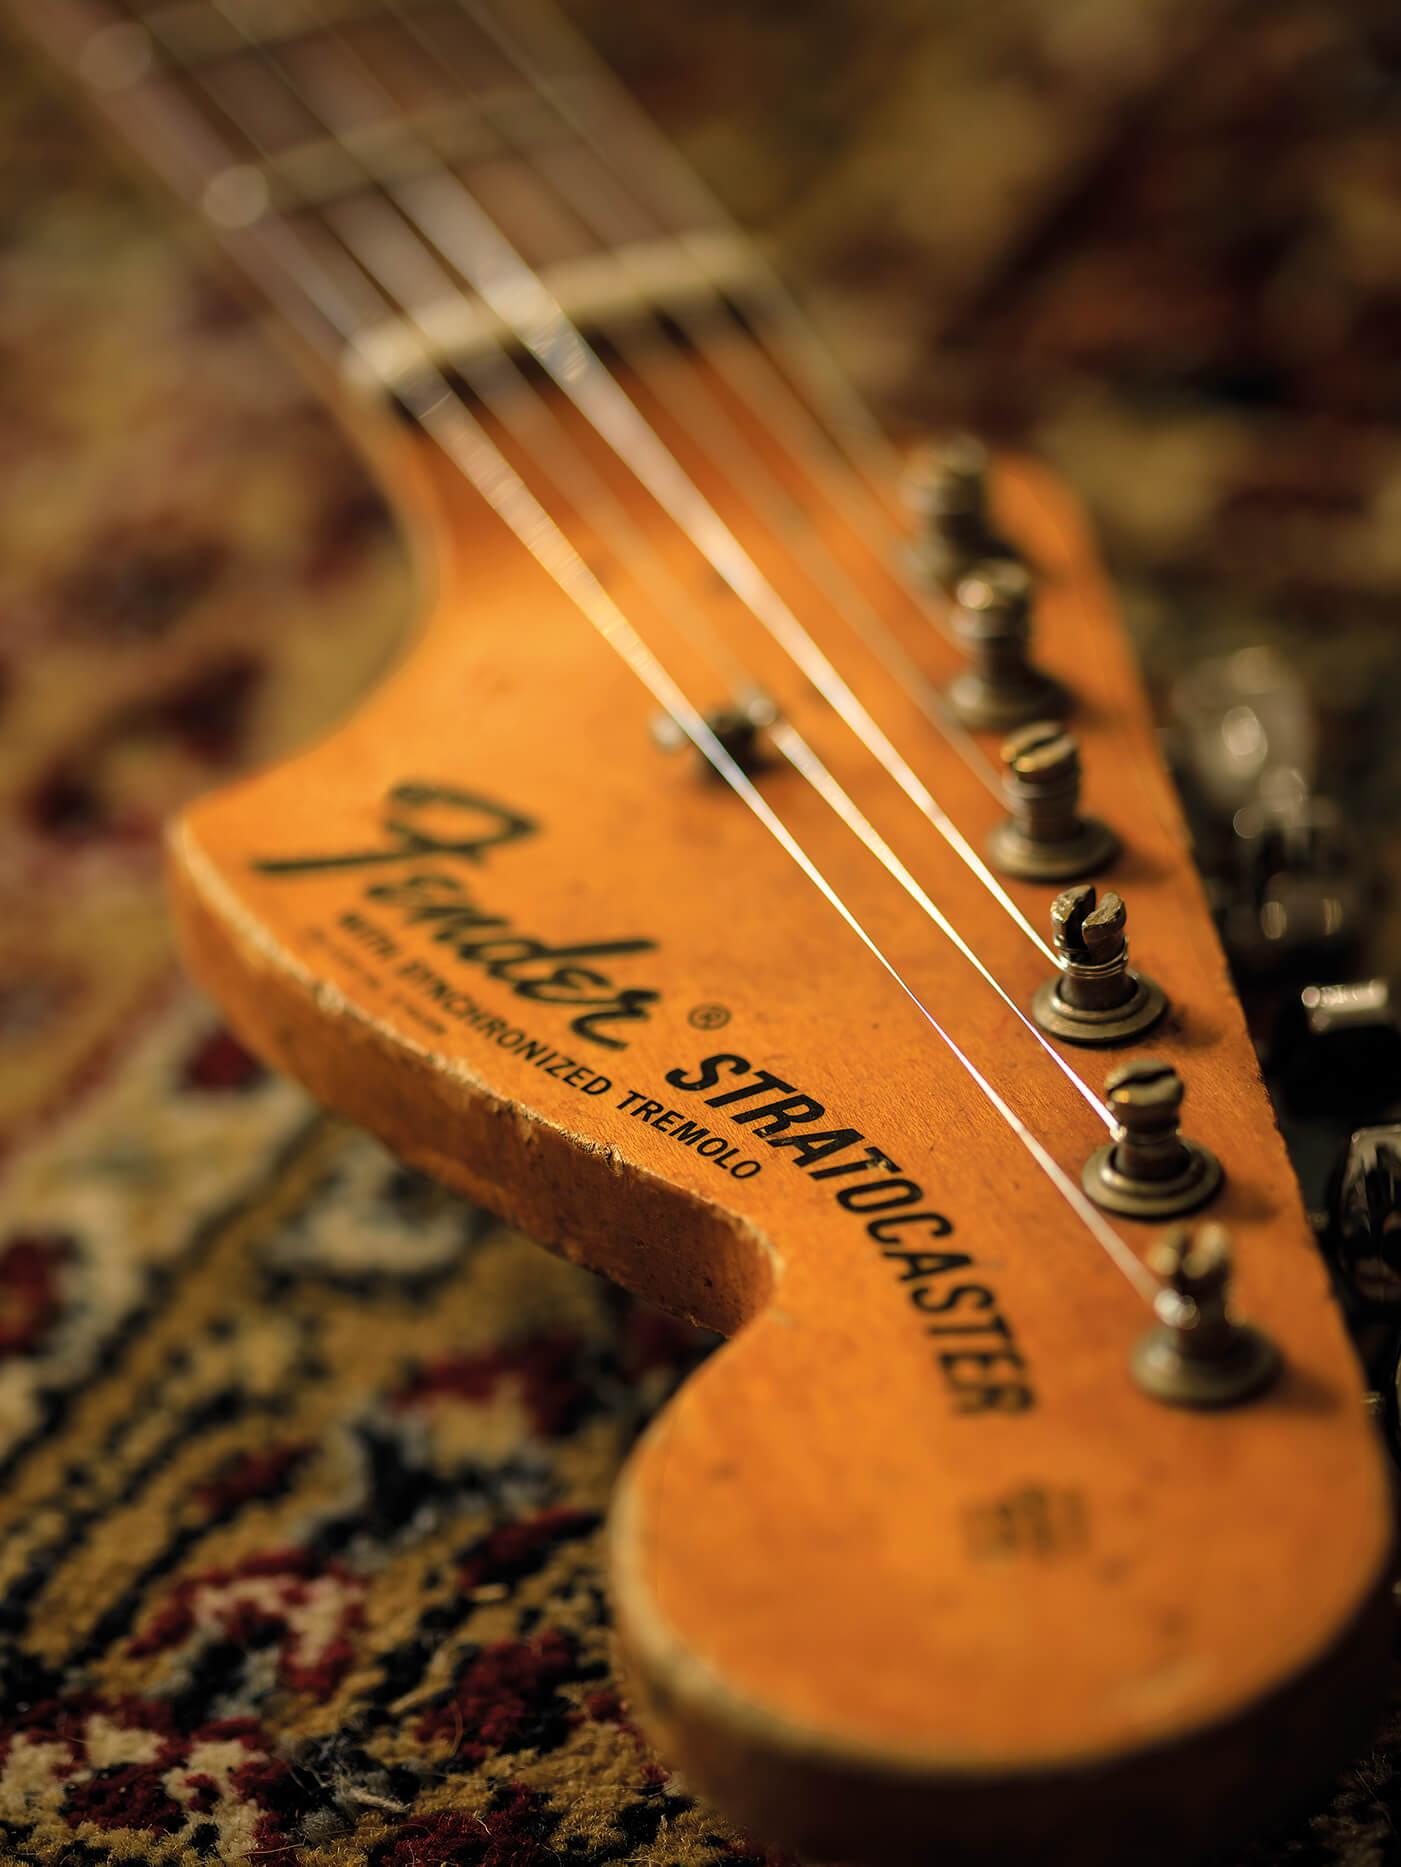 Collections Elite Vintage Guitars 1968 Fender Stratocaster headstock